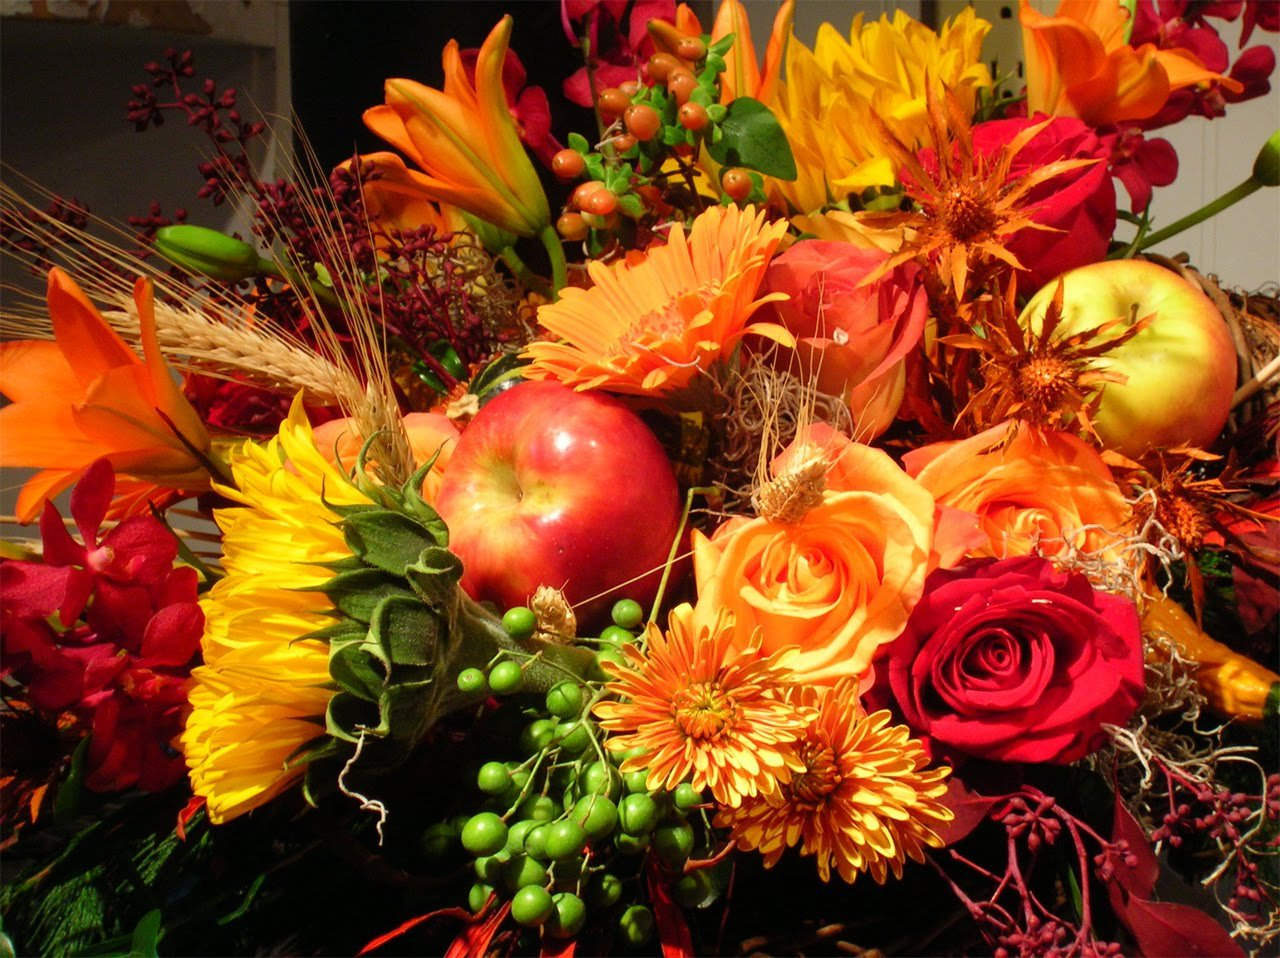 Thanksgiving Flower Wallpaper Thanksgiving Sunflower Pictures 1280x958